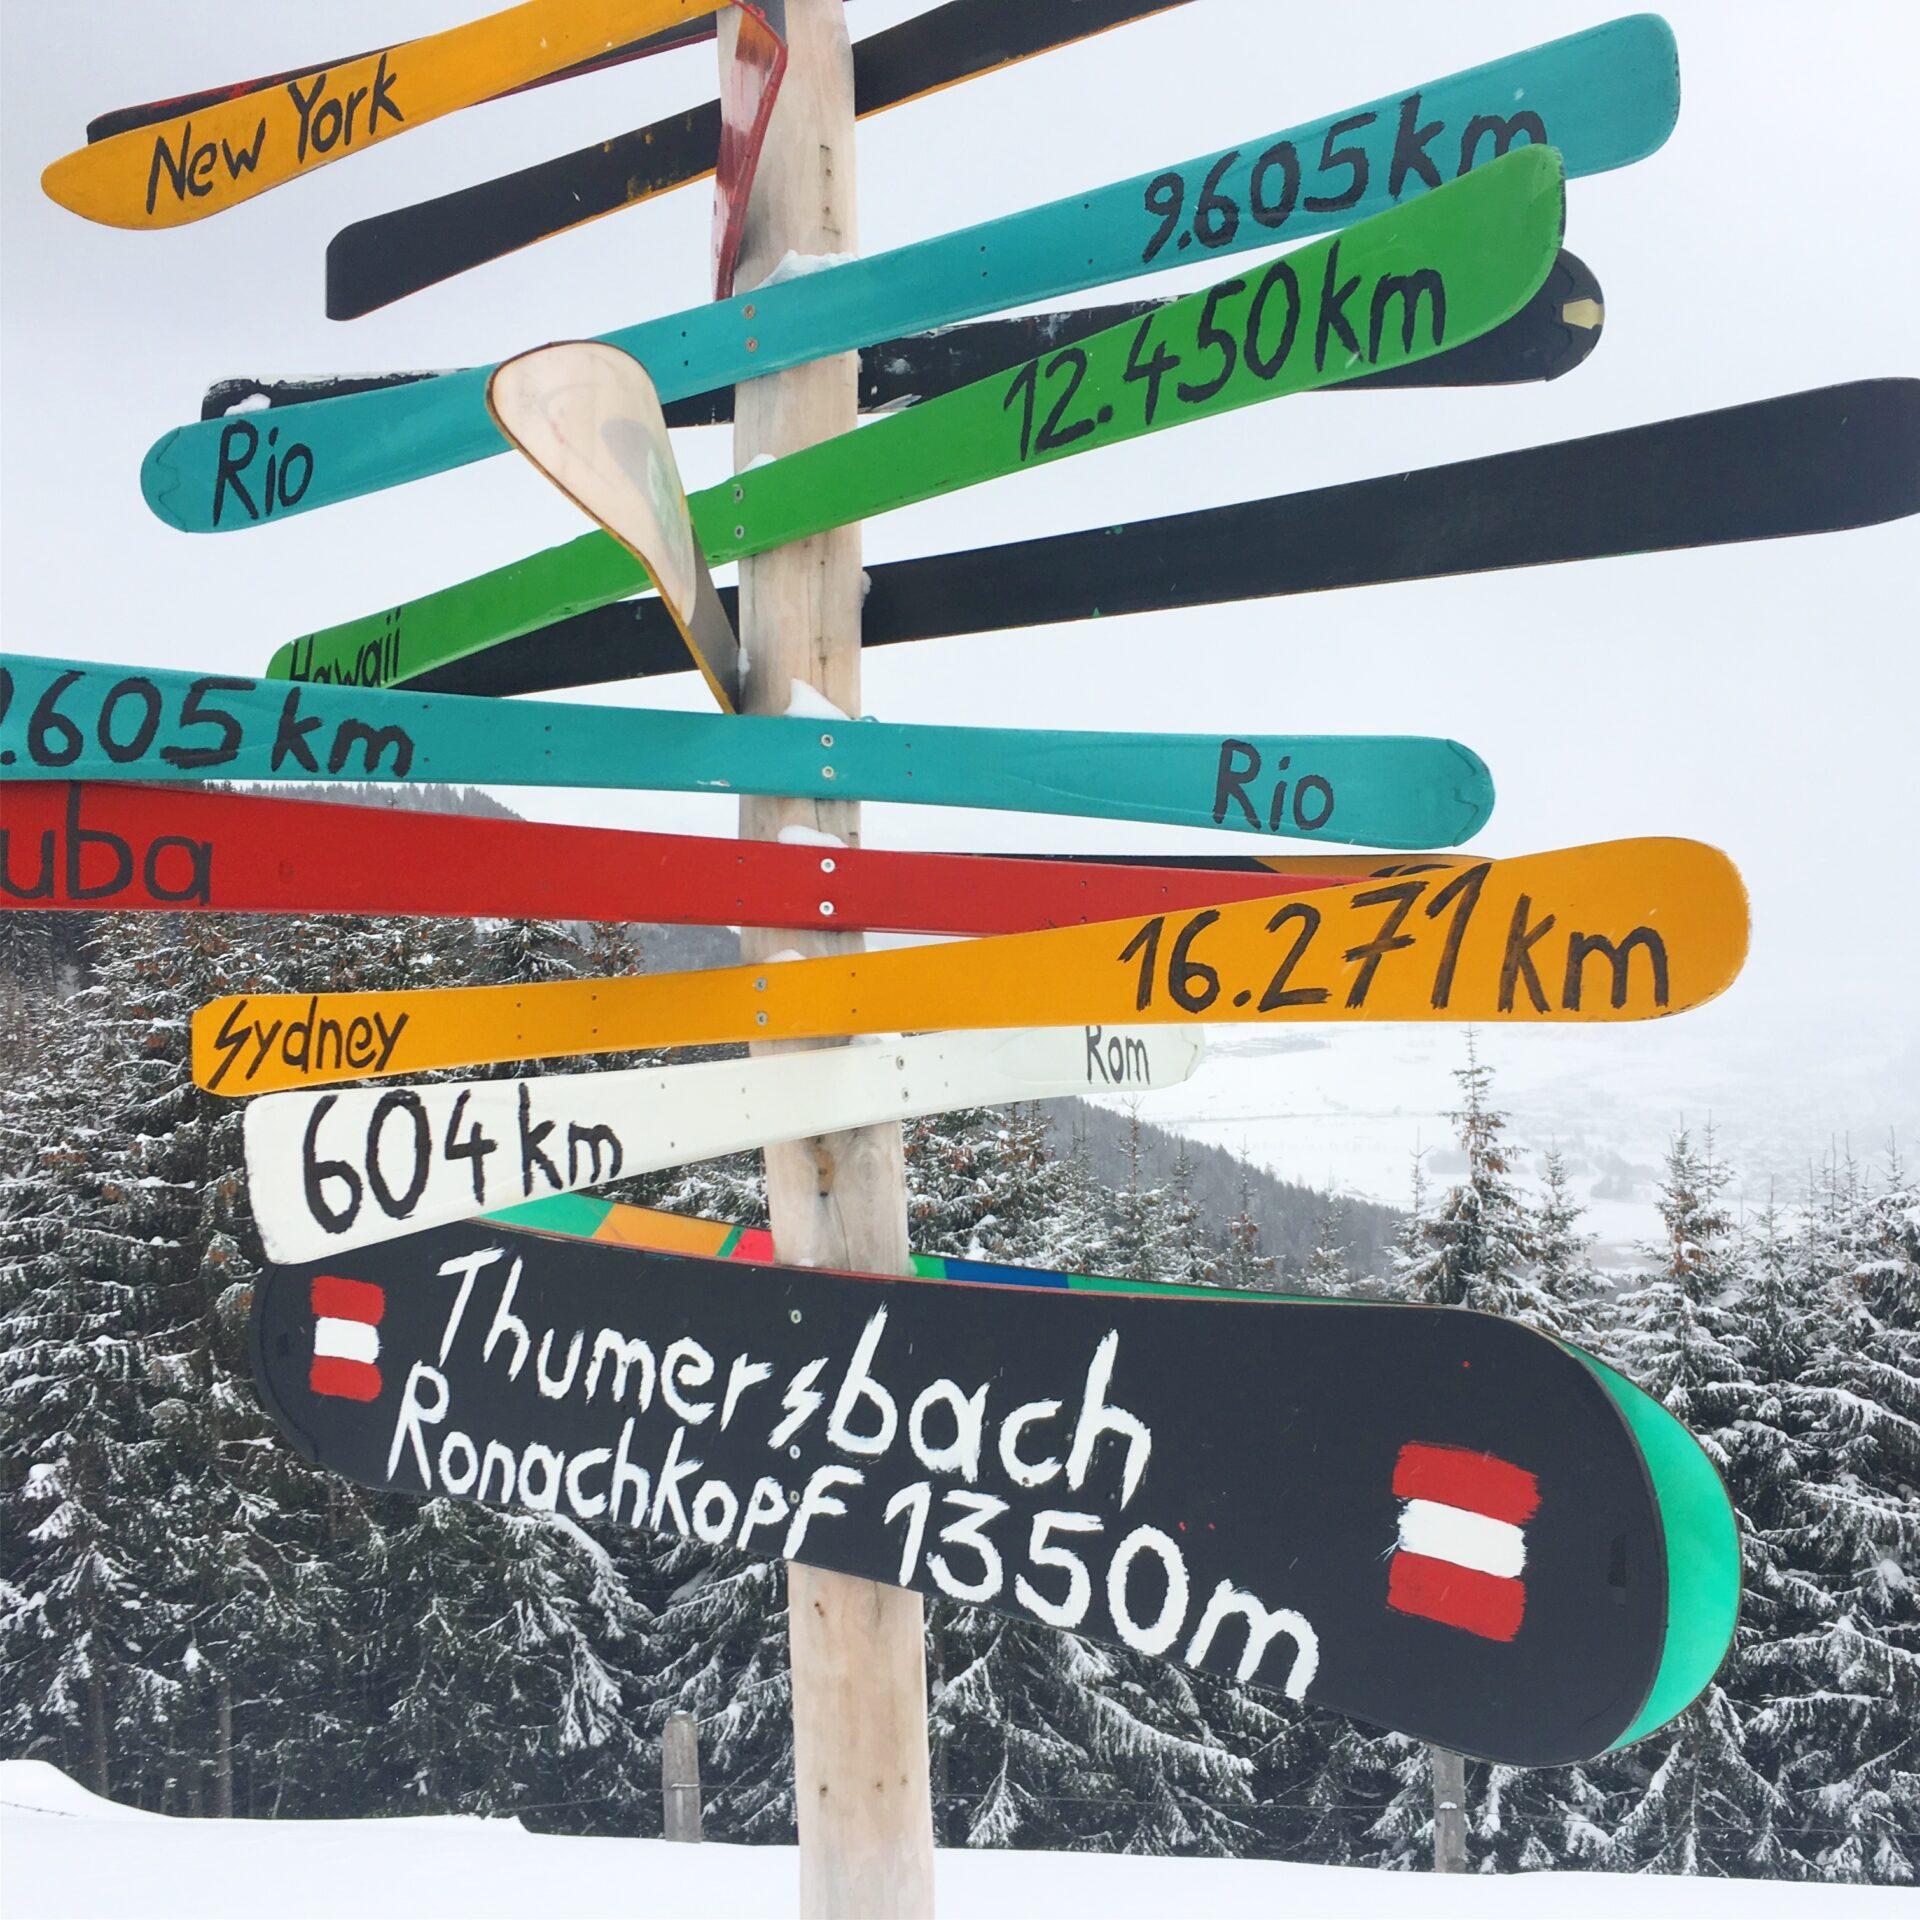 Skitour Ronachkopf Zell am See